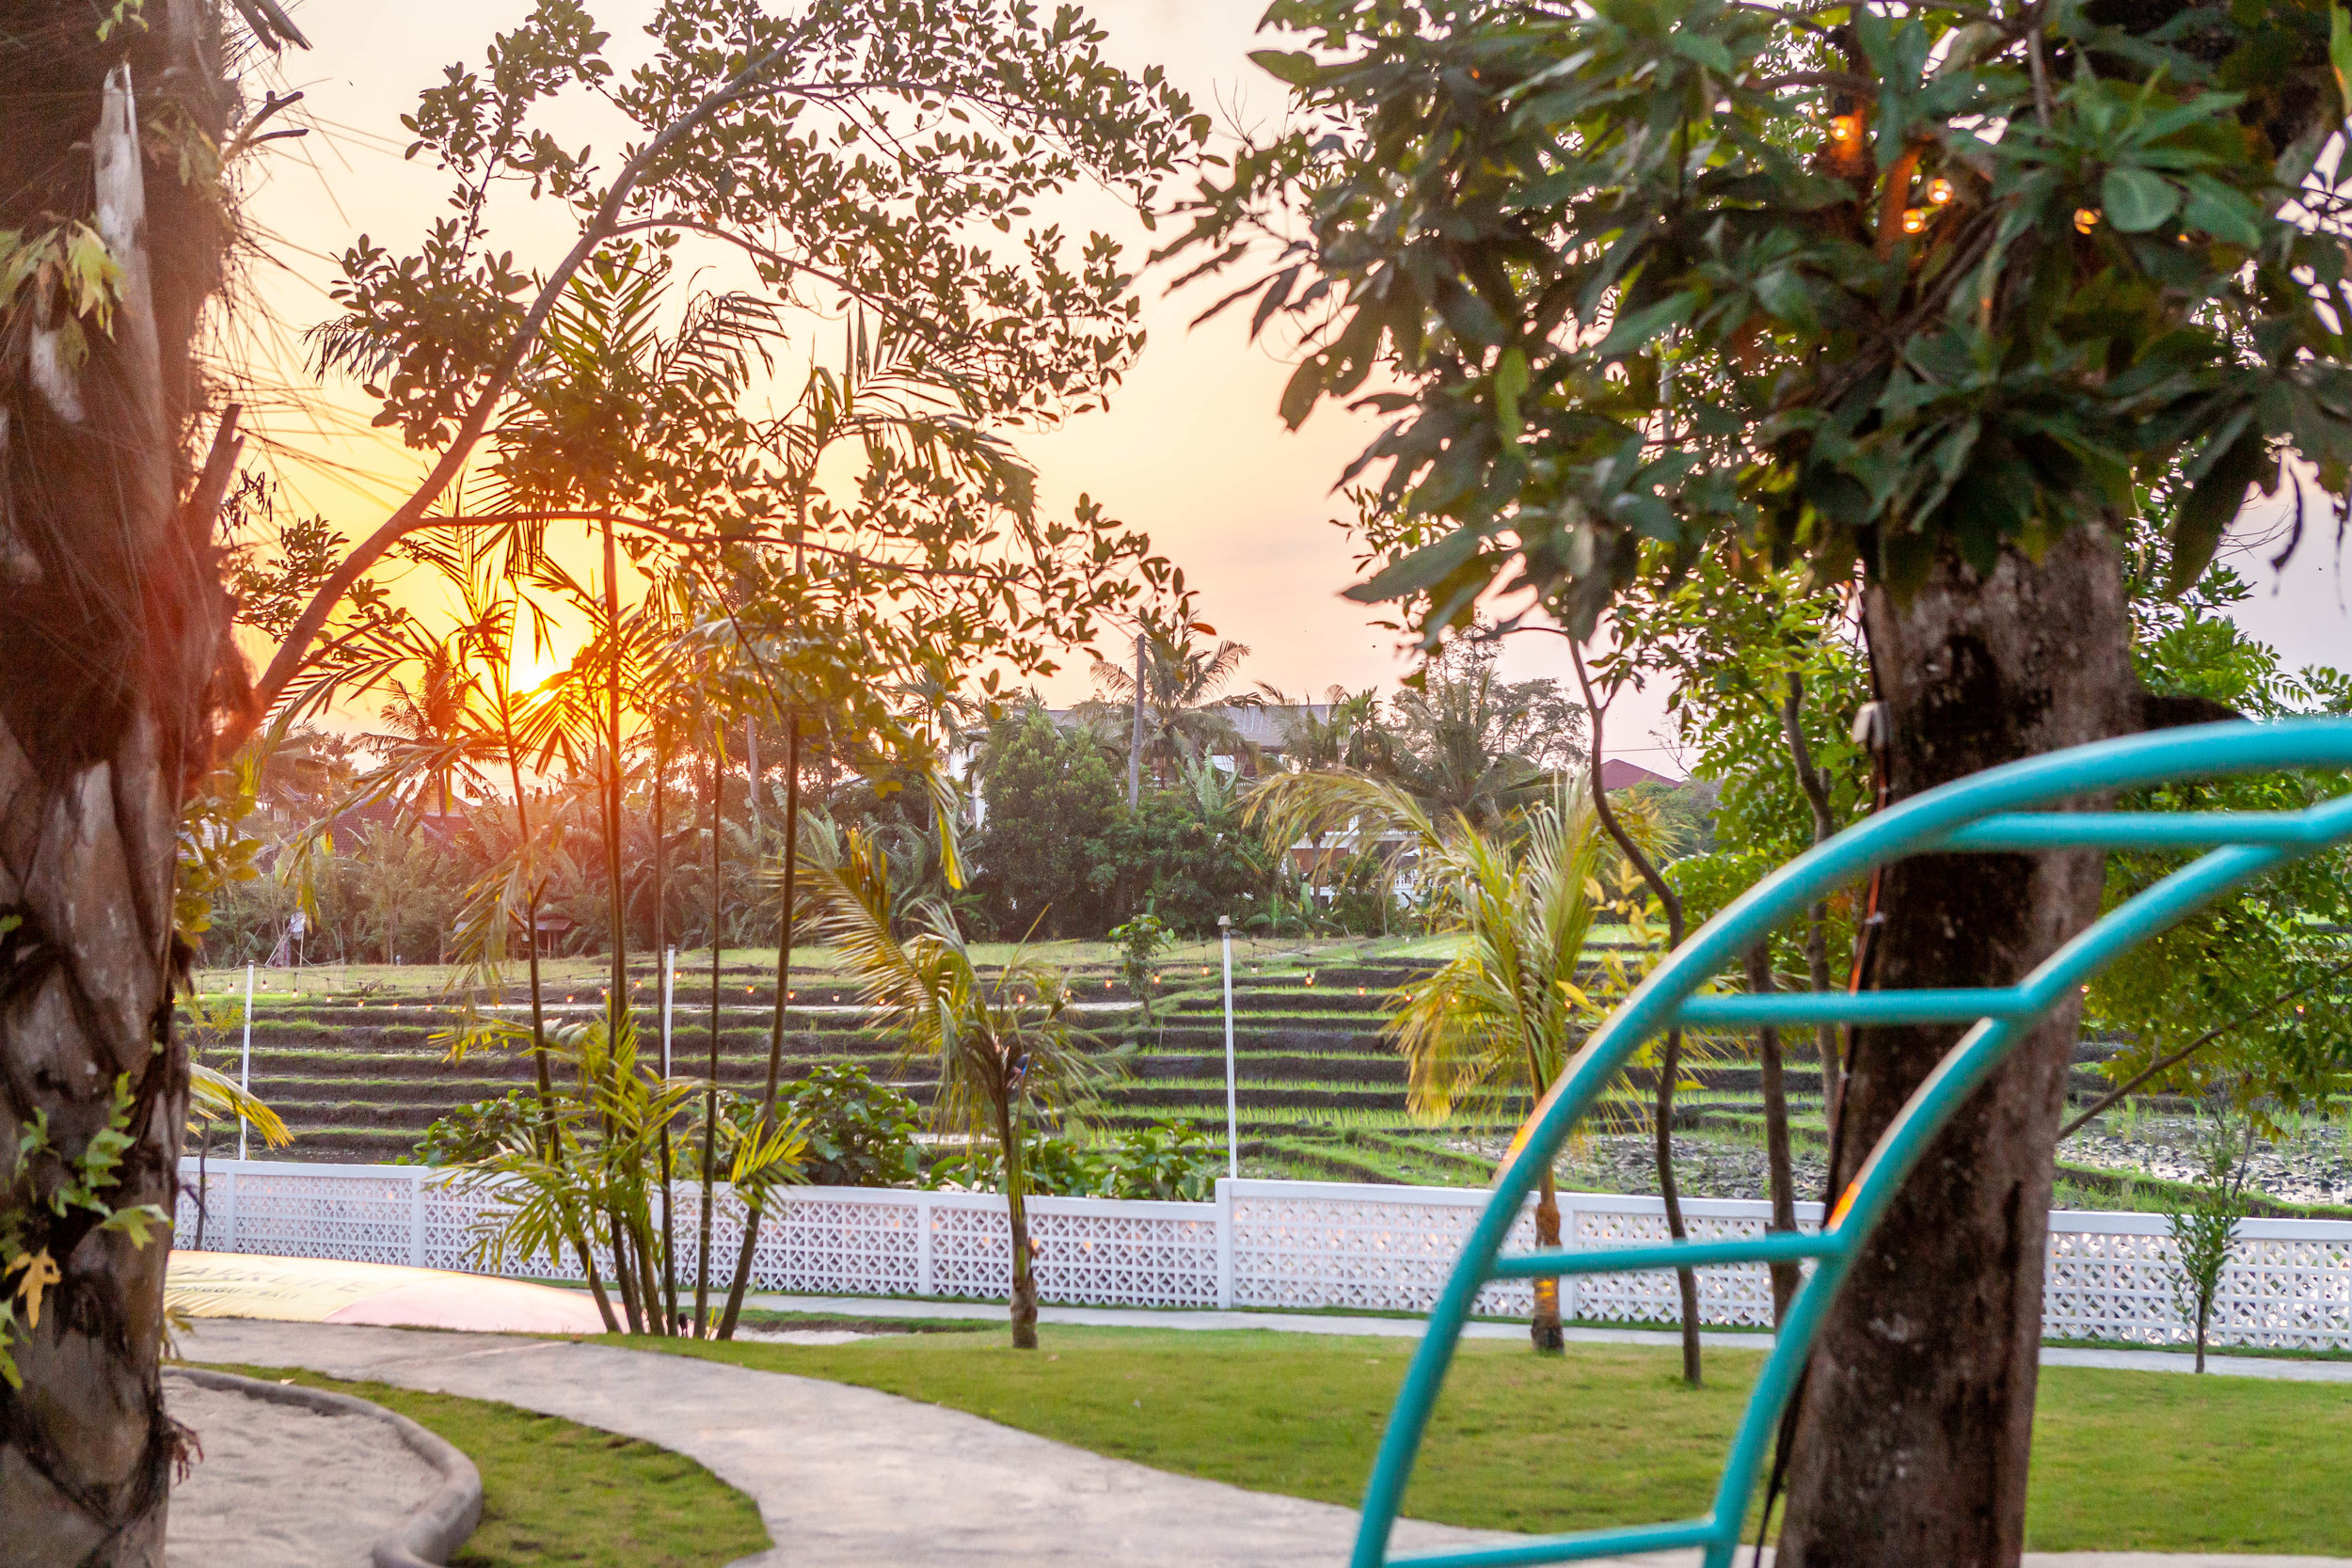 Sunset with Monkey Bars.jpg